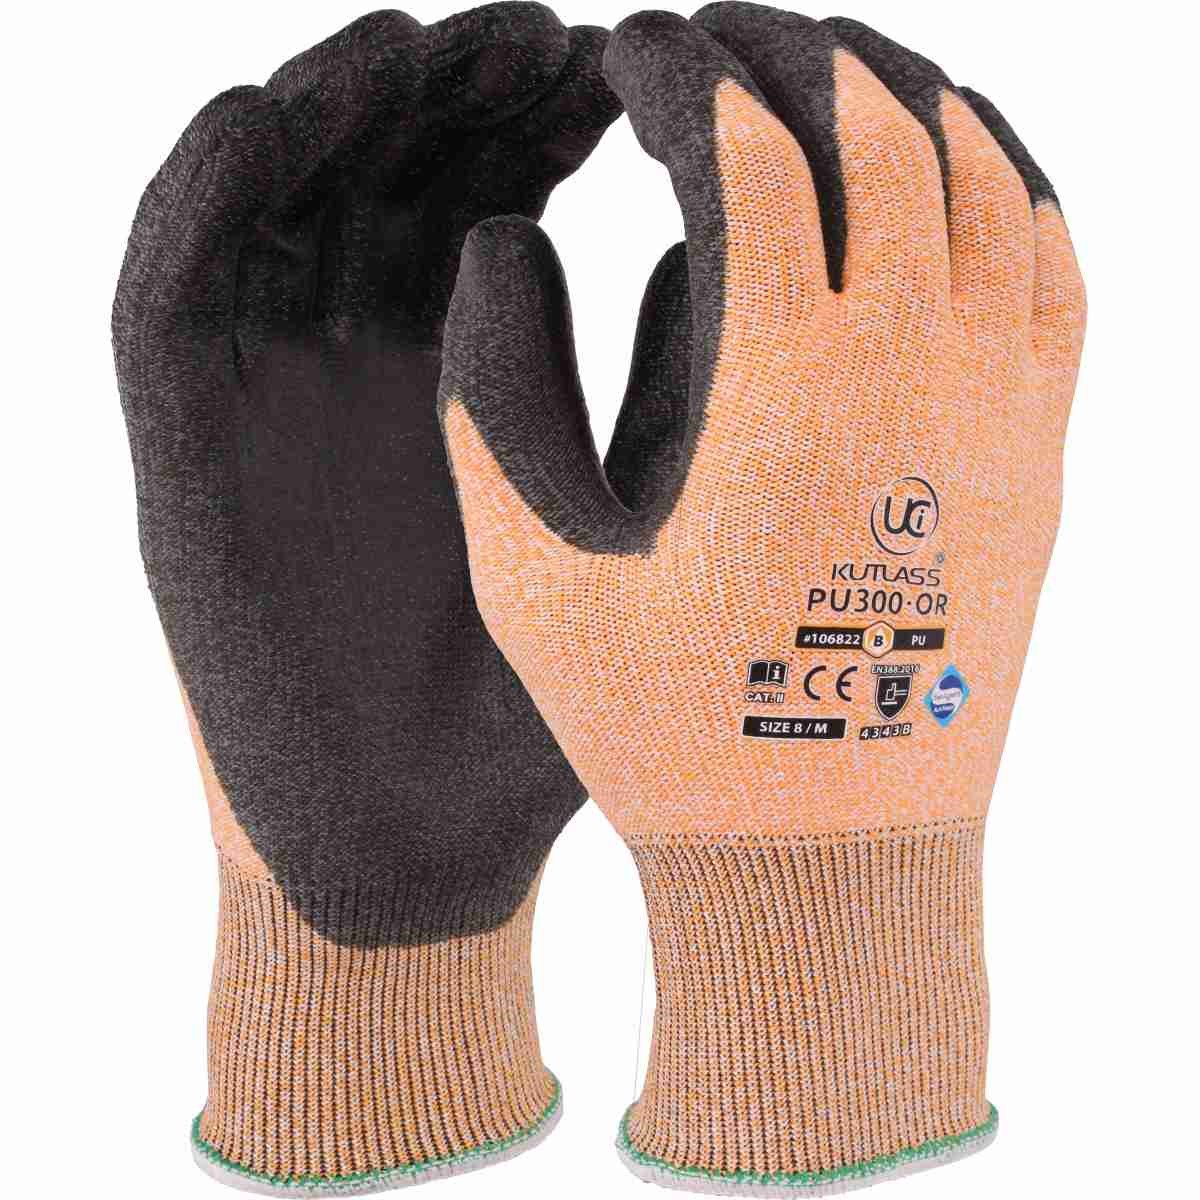 Safety UCI Kutlass PU300 Grey PU Palm Coated Cut Resistant Gloves Size 9 LARGE